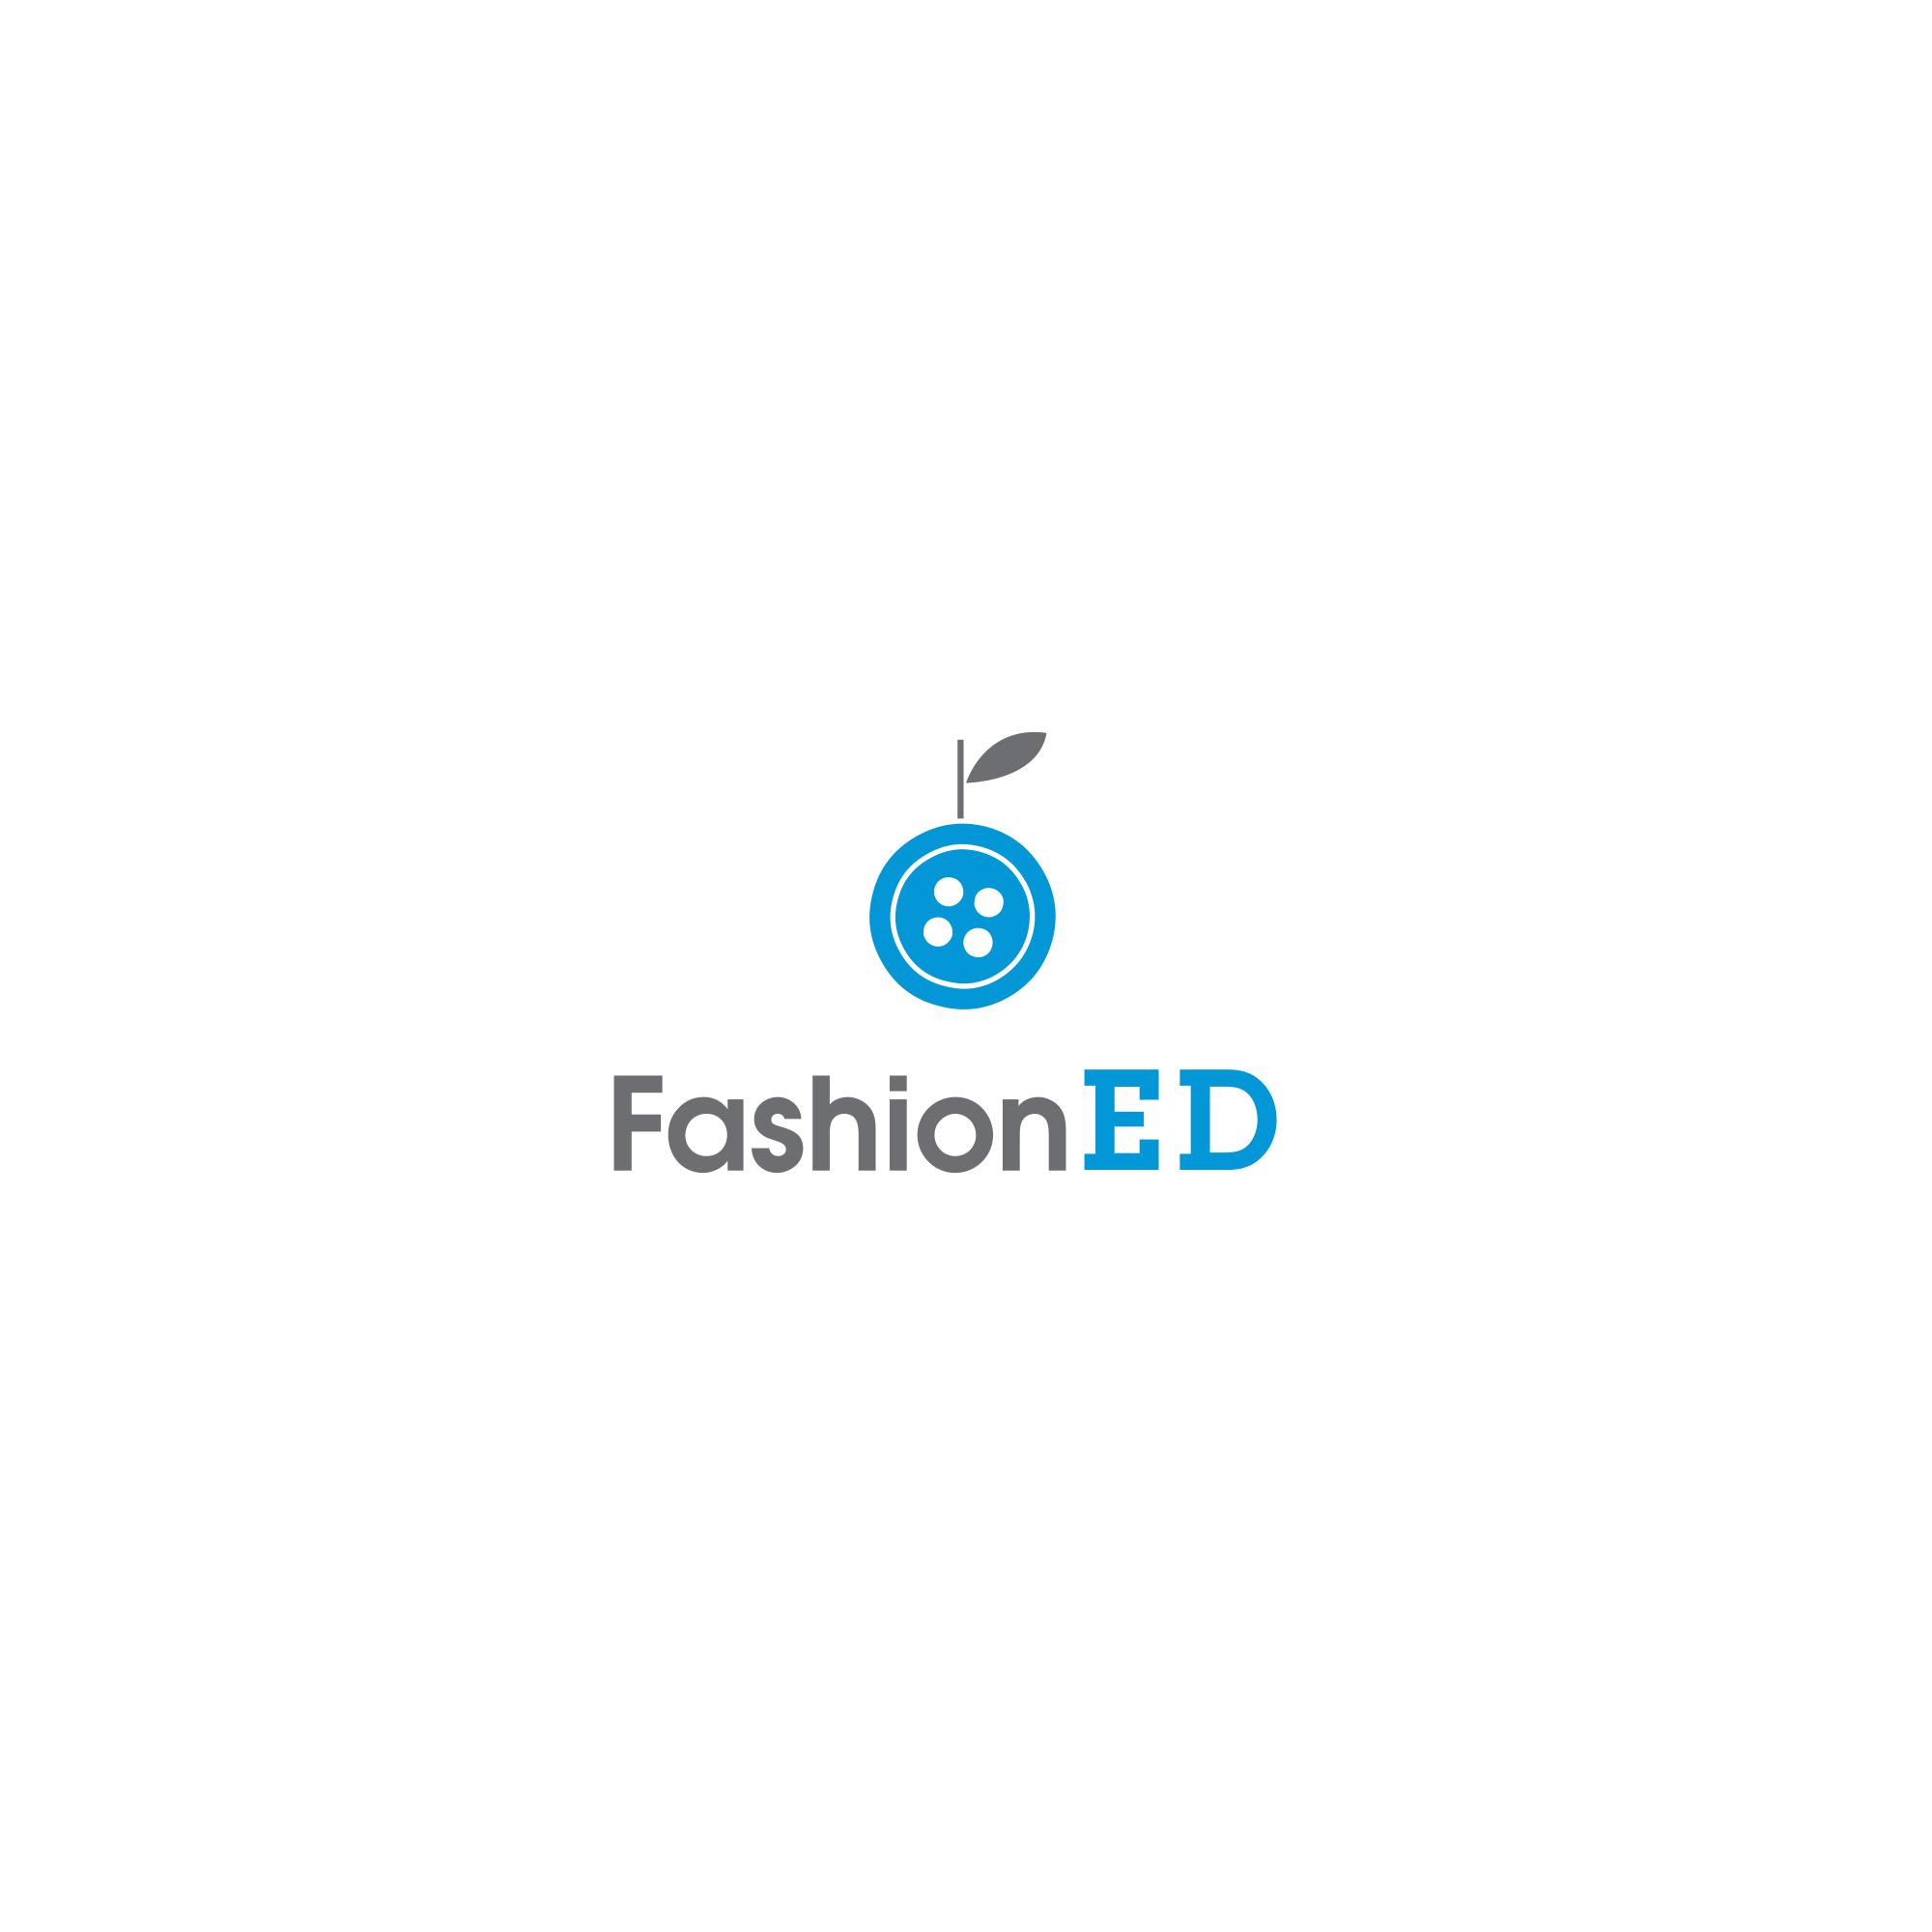 brandmarks_0003_FashionEd2.jpg